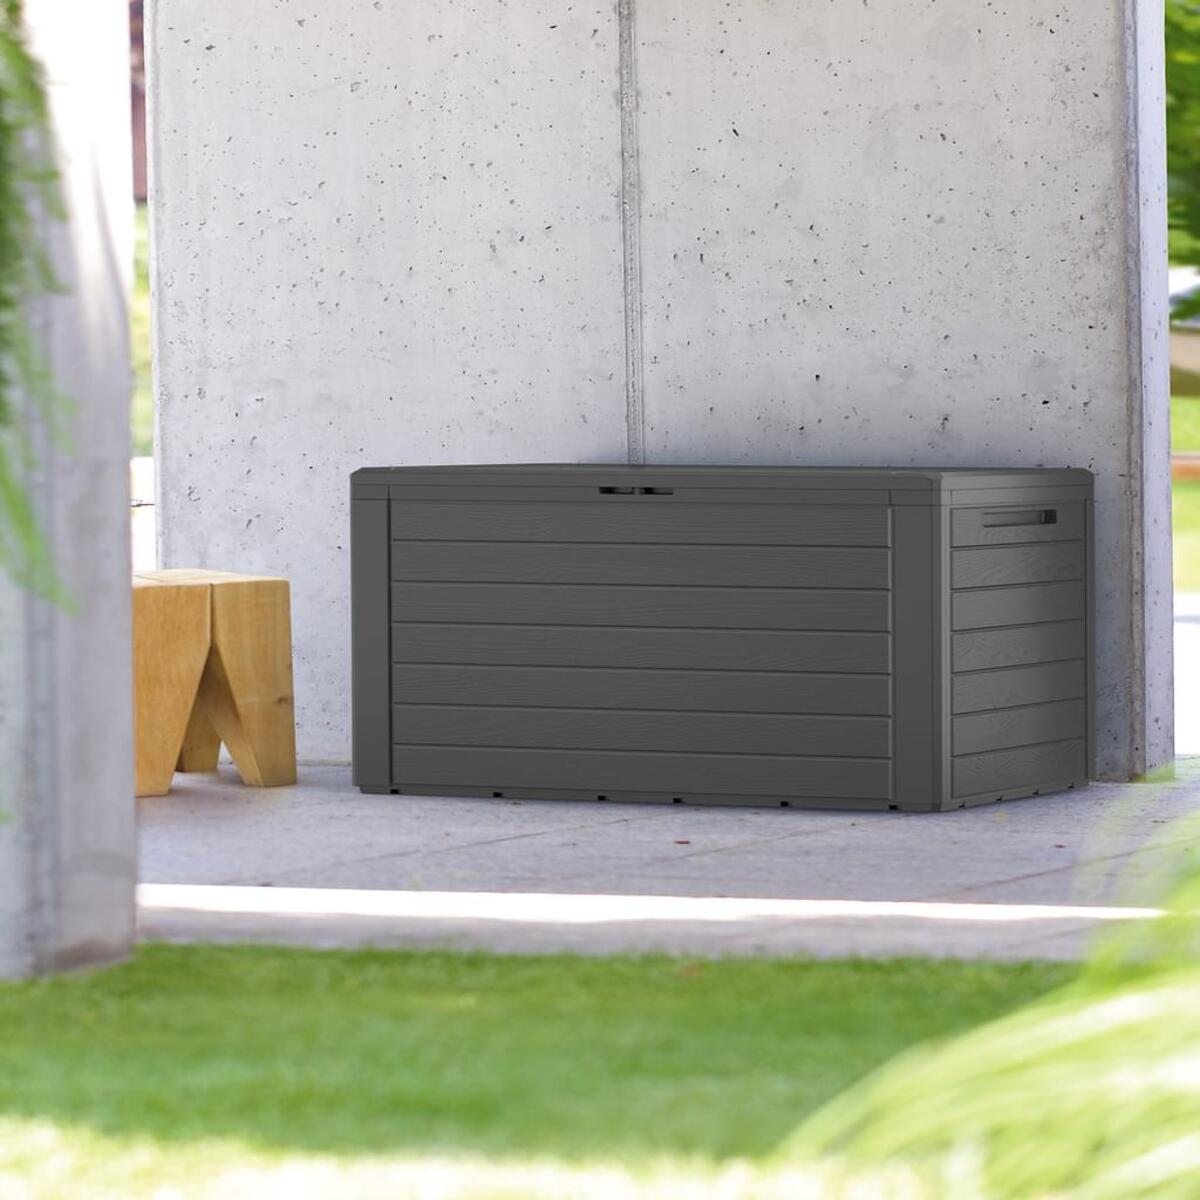 Bild 2 von Deuba Woody Holzoptik Deckel klappbar 120x46x57cm Kissenbox Gartenbox Garten Truhe Tischtruhe